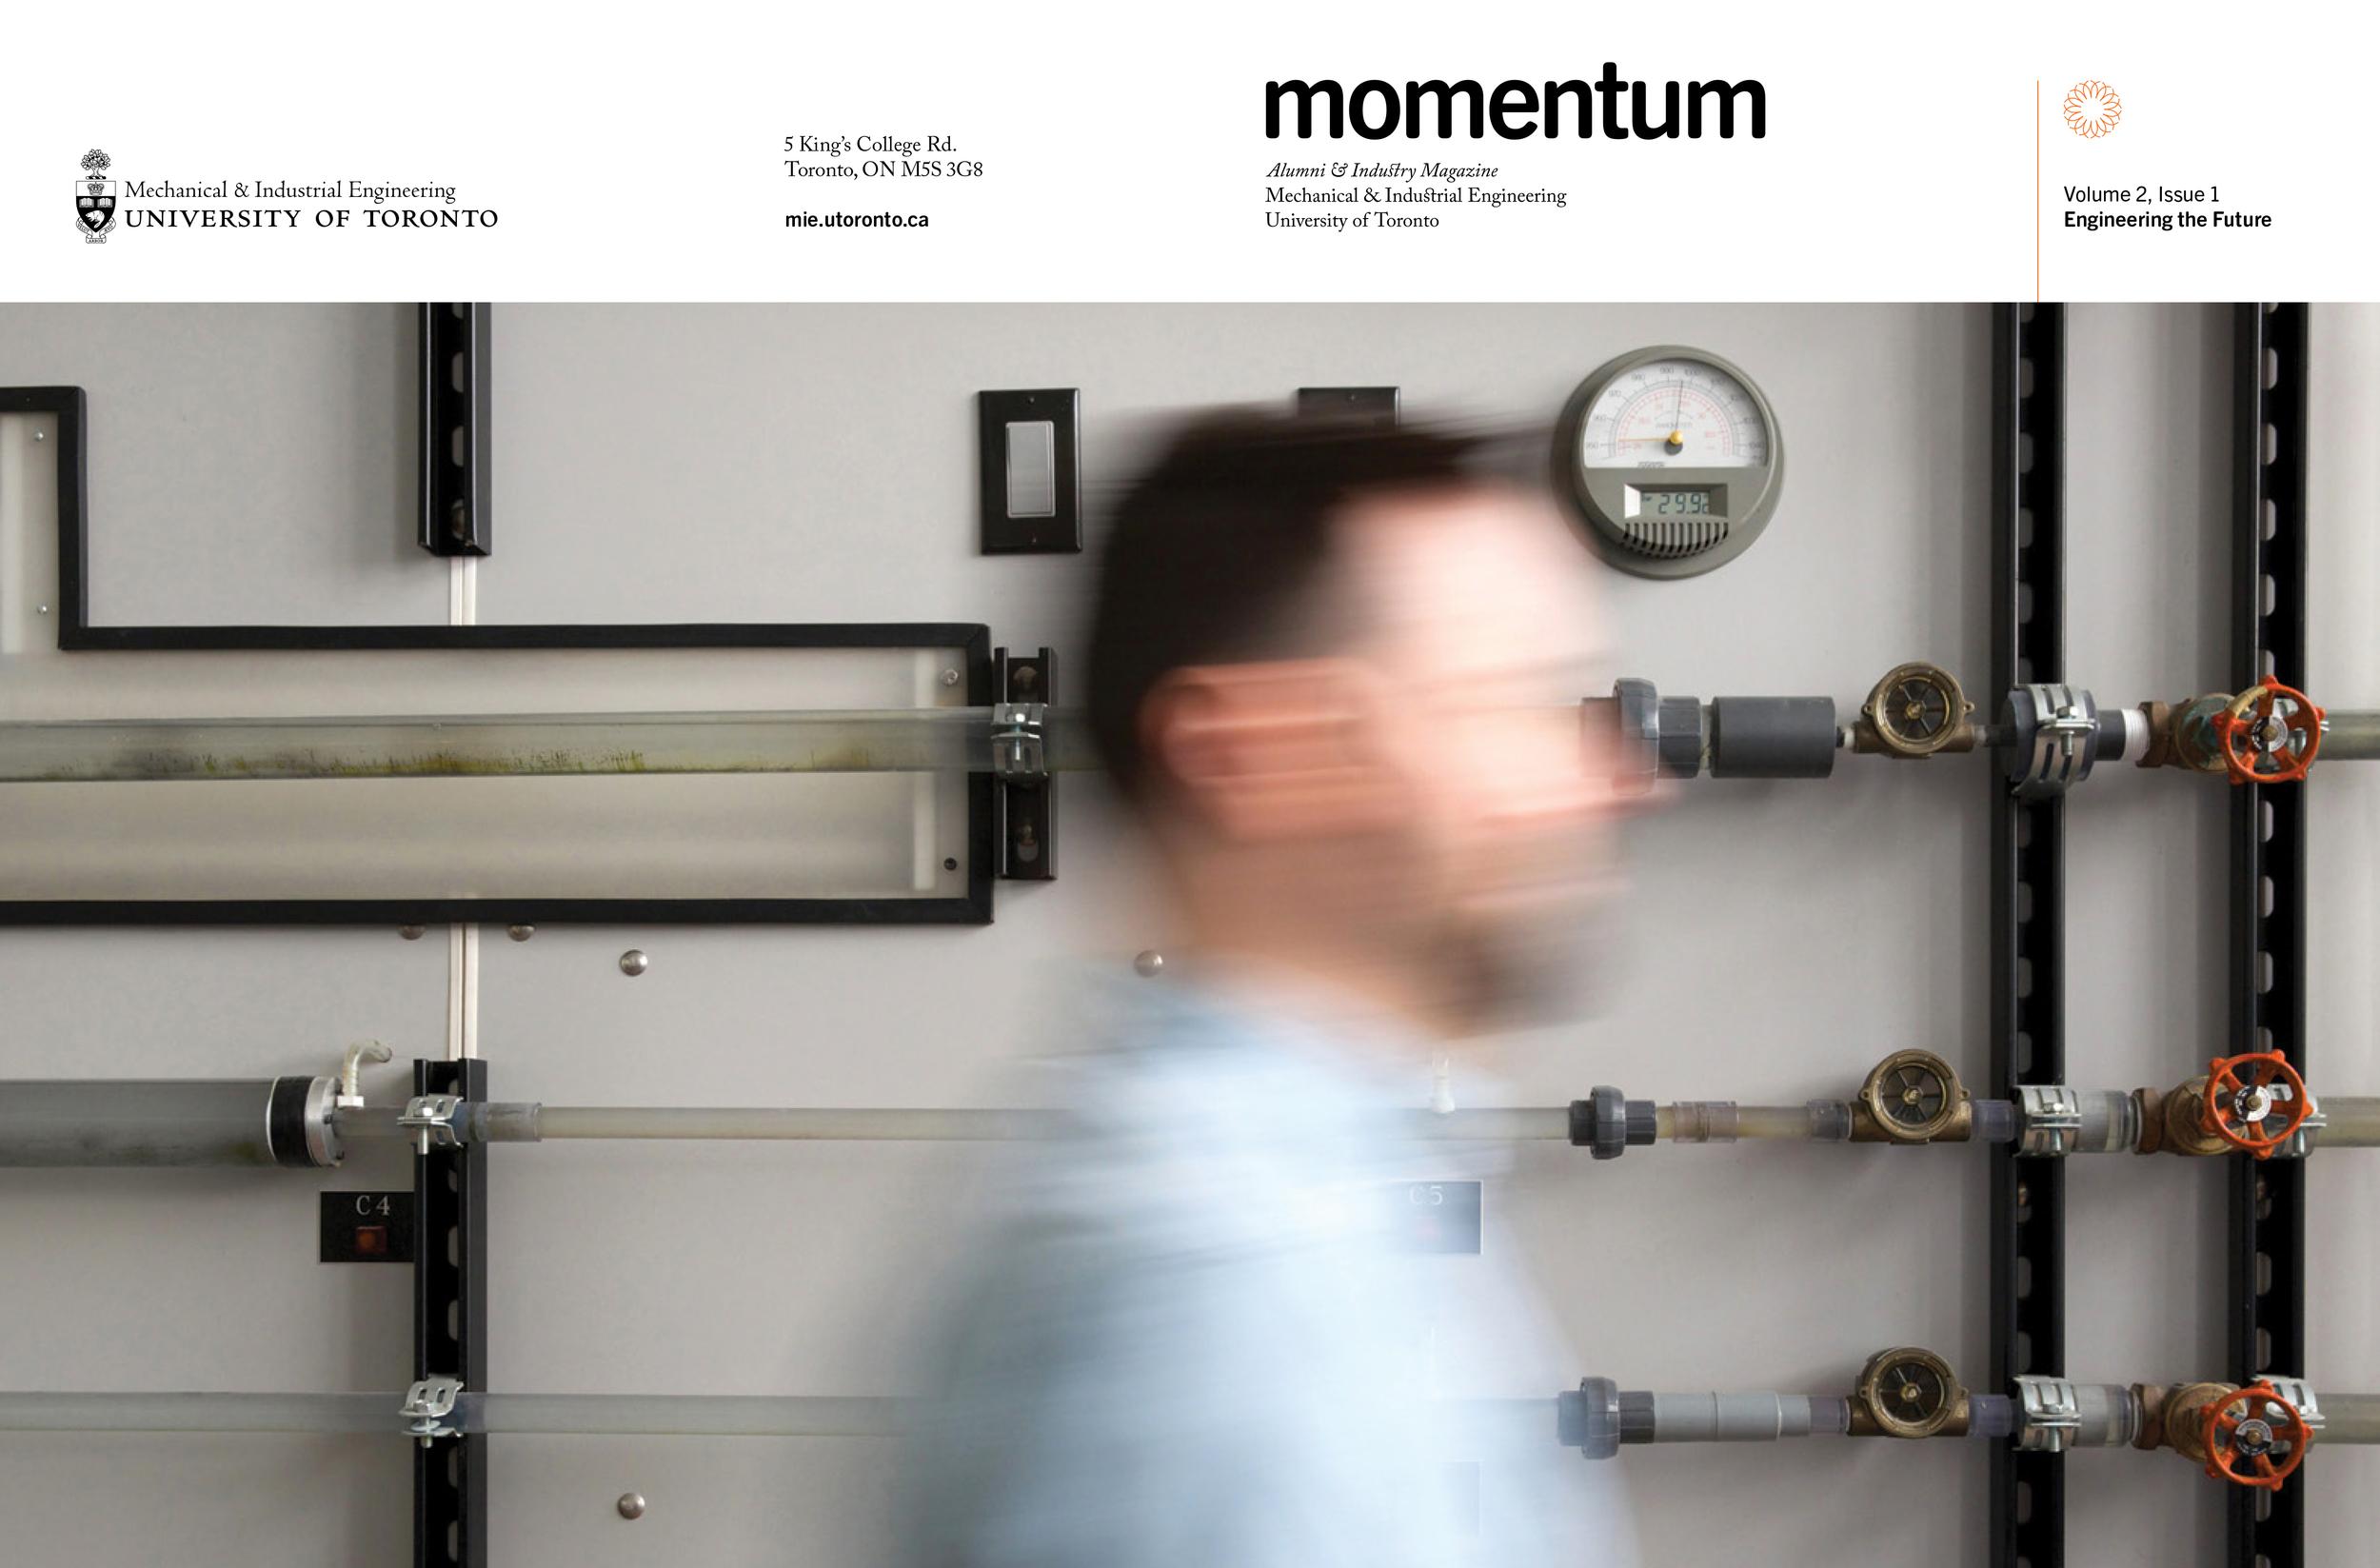 Momentum2014Vol2Iss1-1.jpg